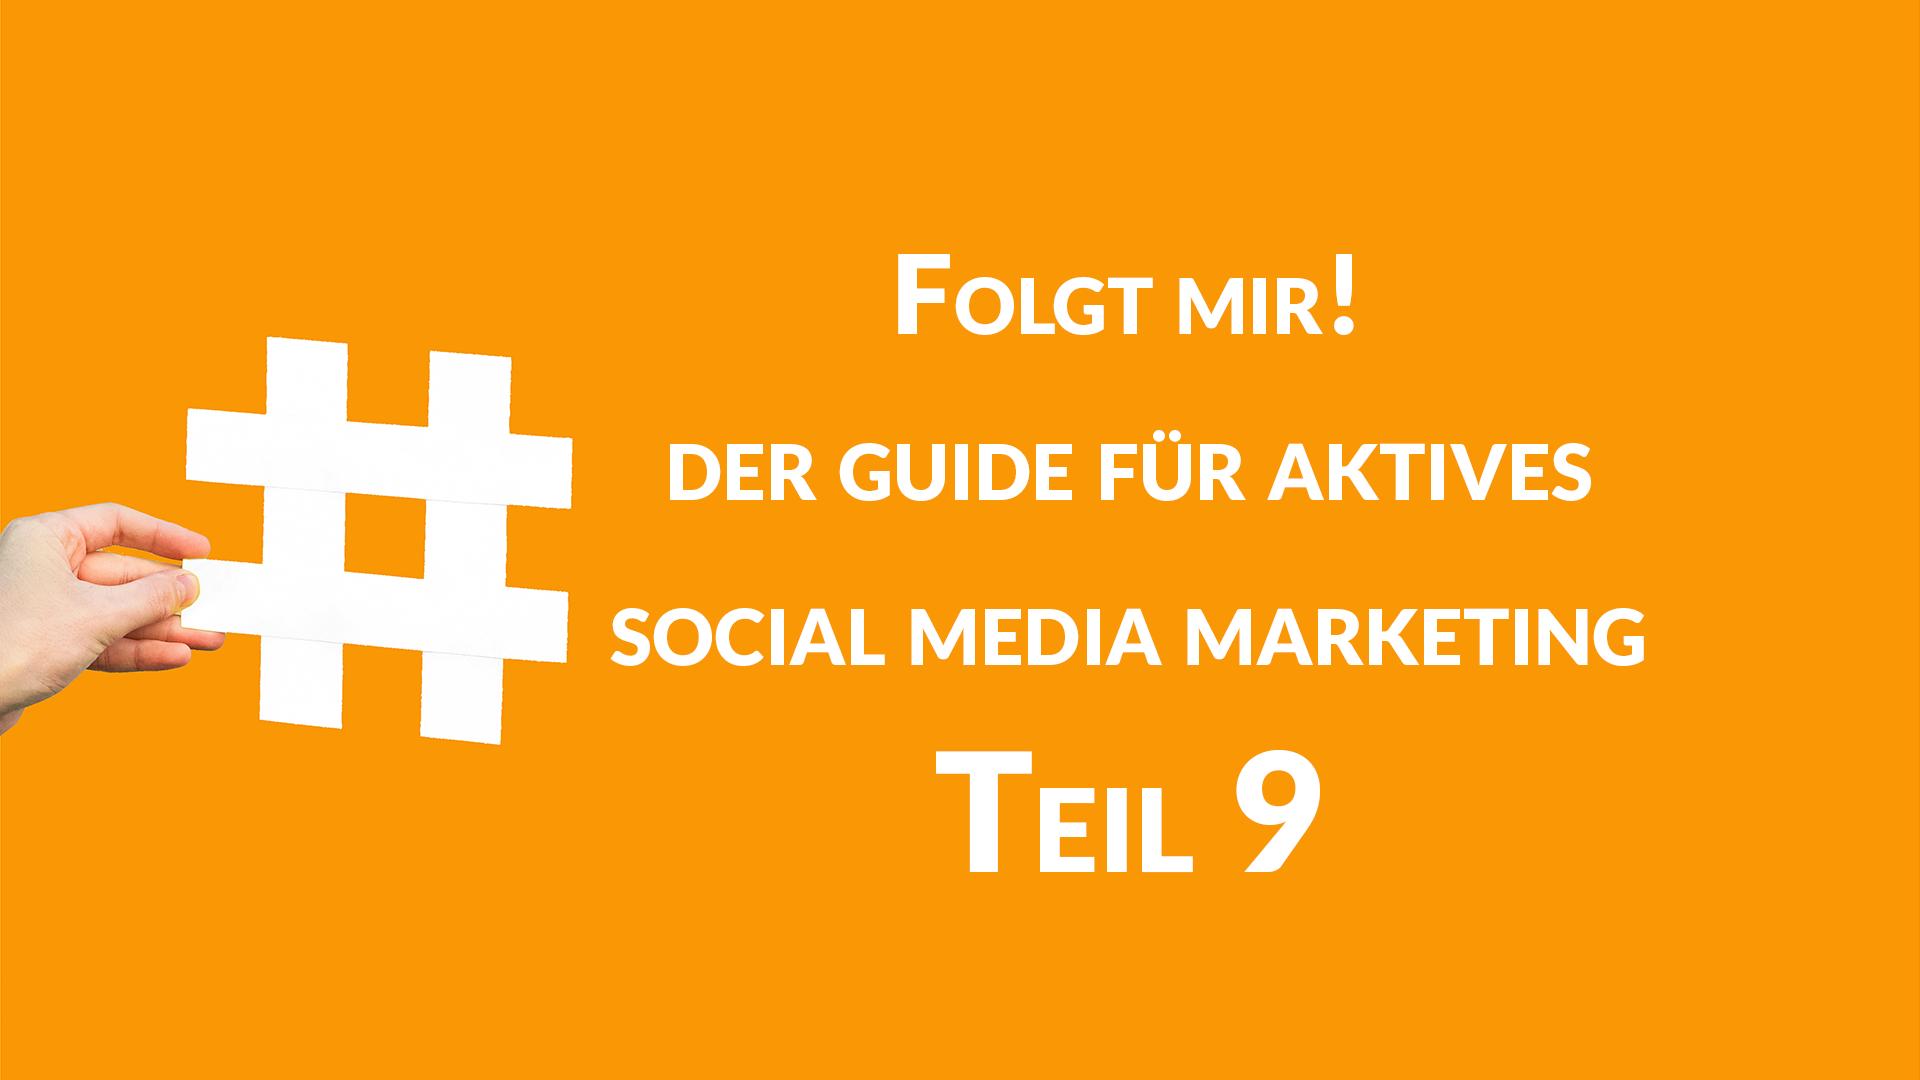 Social Media Marketing Content Curation